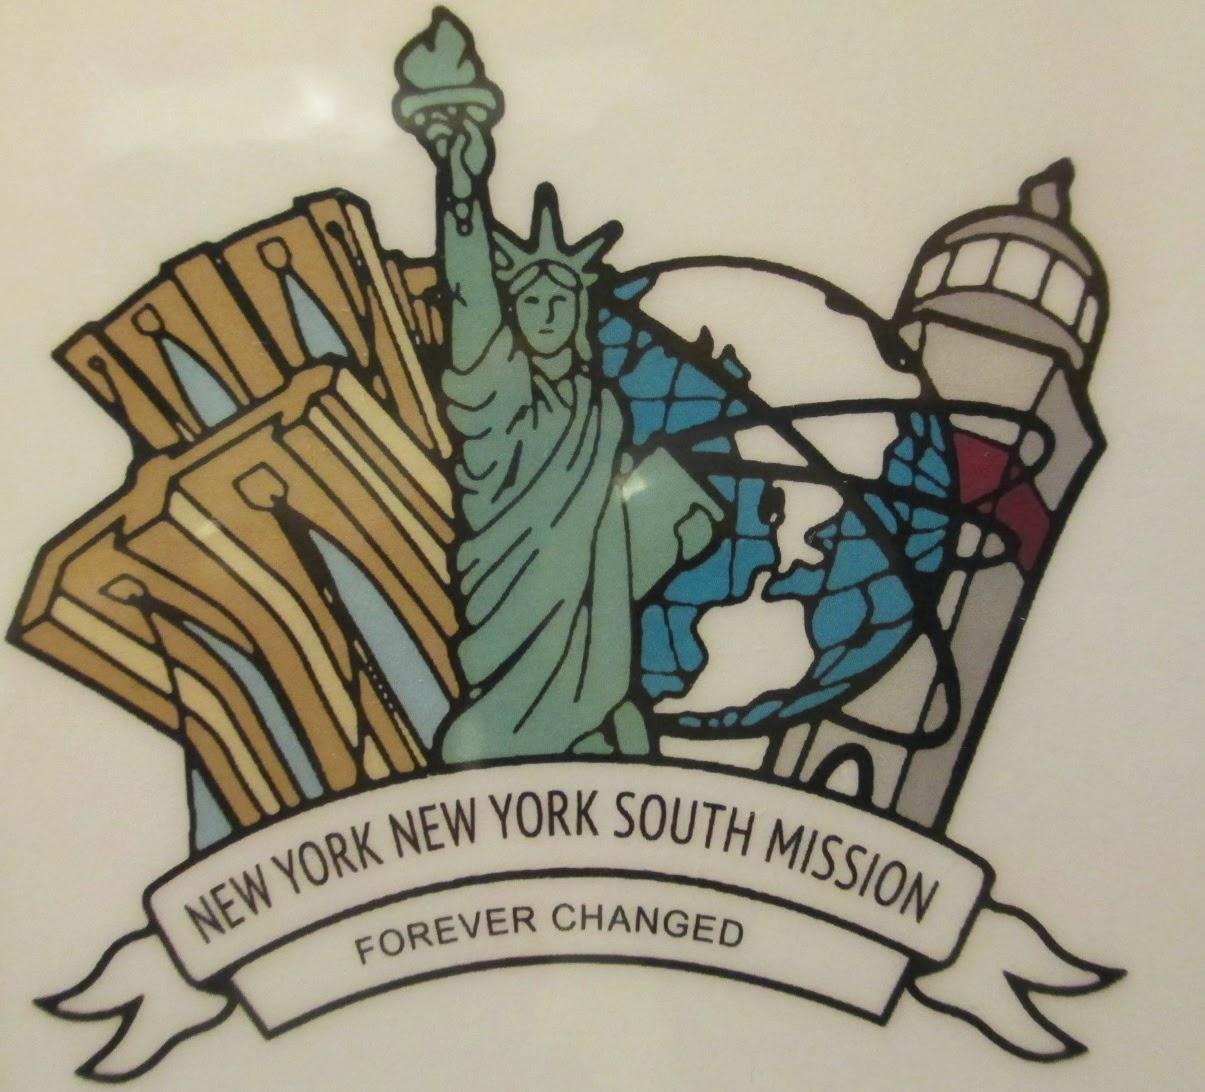 NYNY South